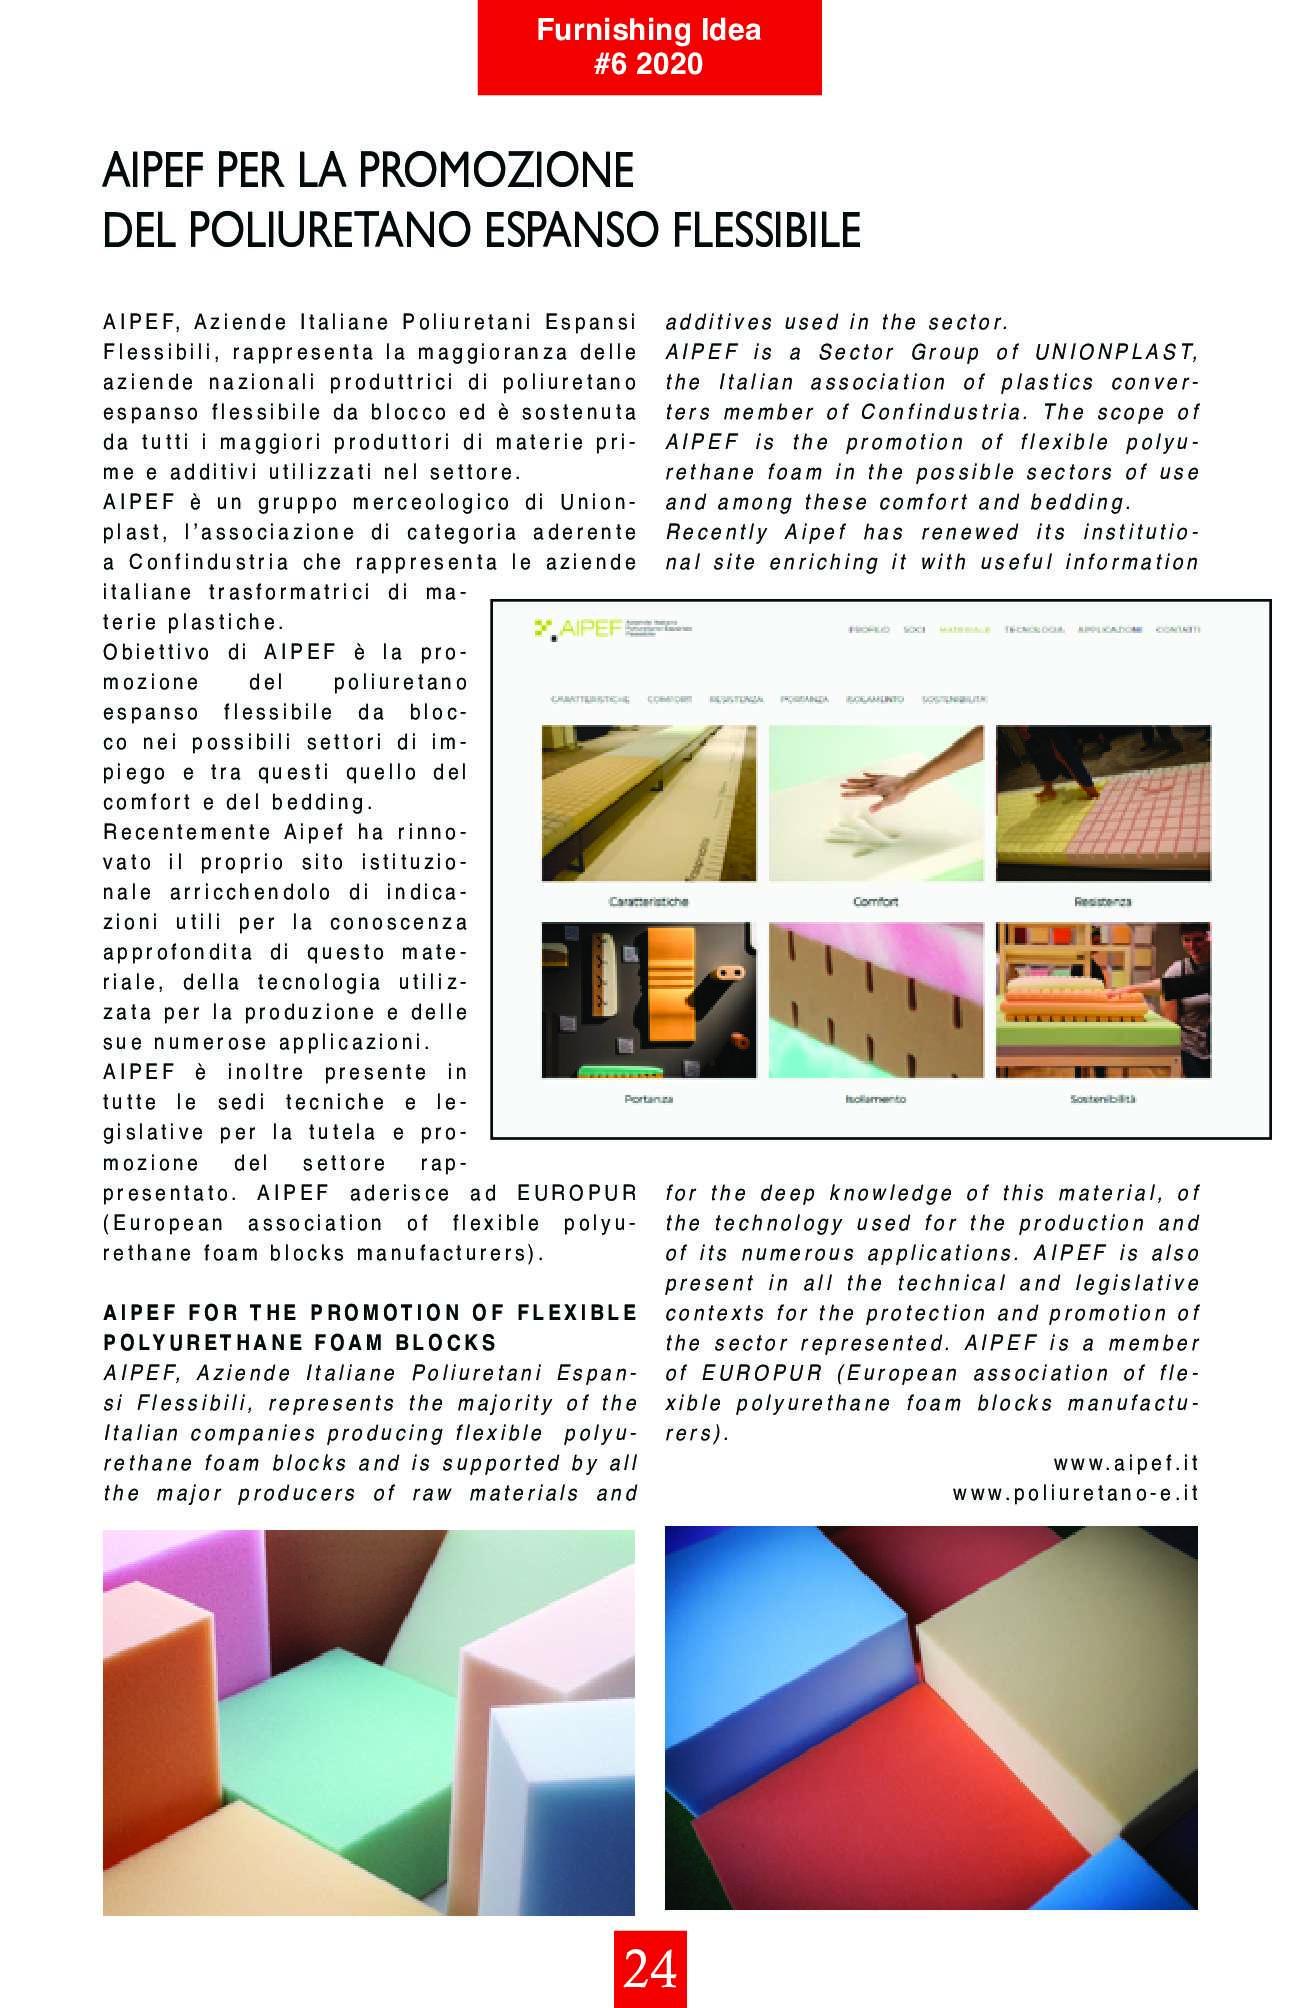 furnishingidea-6-2020_journal_22_023.jpg